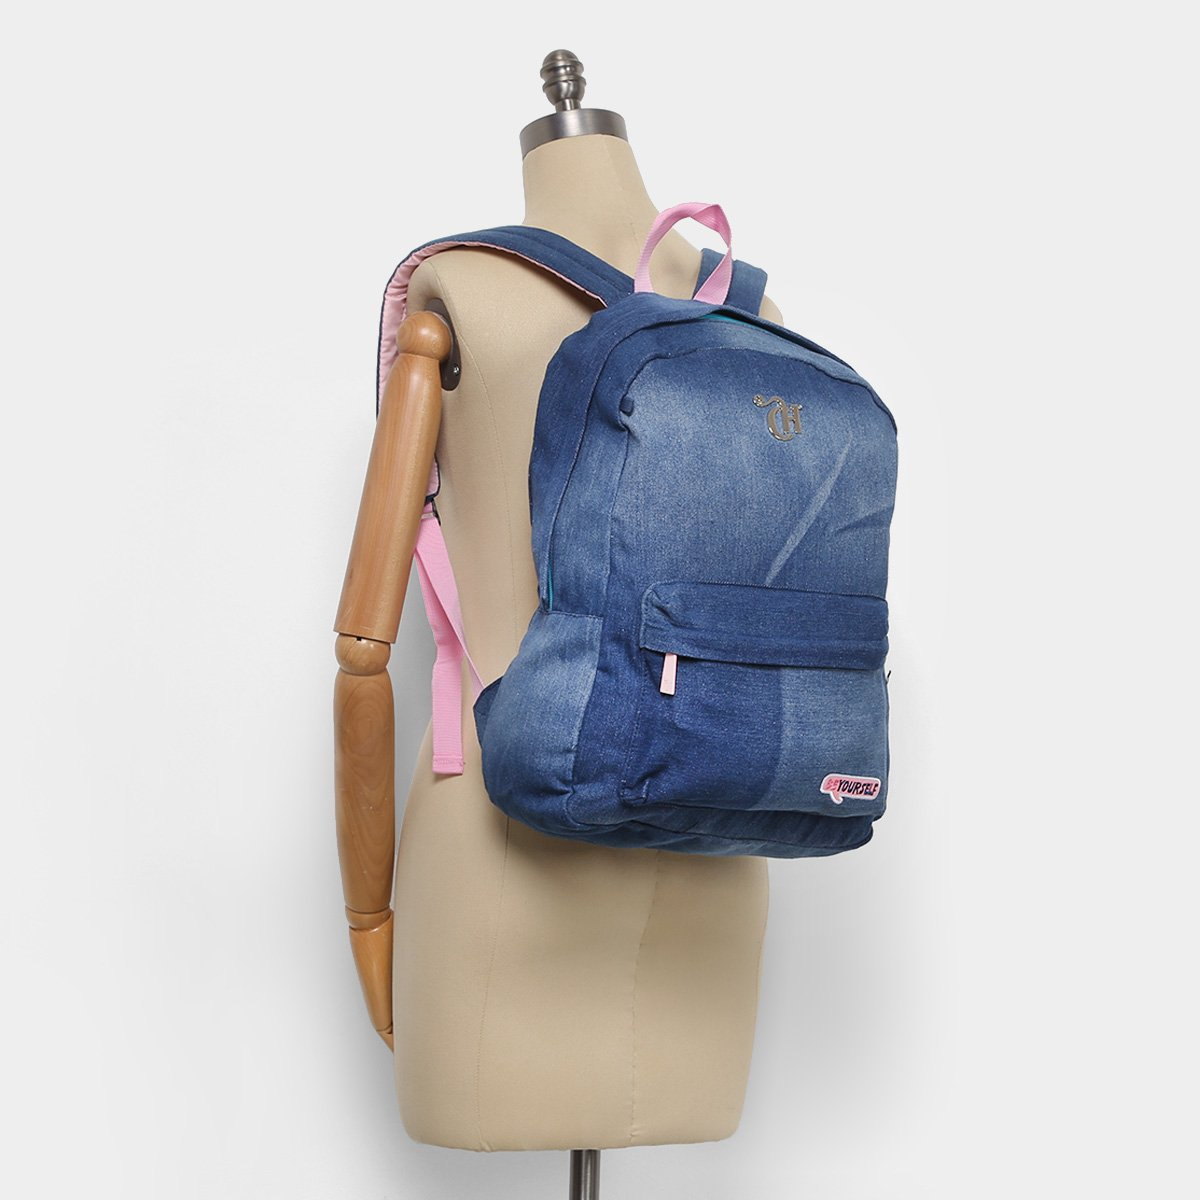 17919db8b Mochila Escolar DMW Jeans Capricho Feminina - Shopping TudoAzul